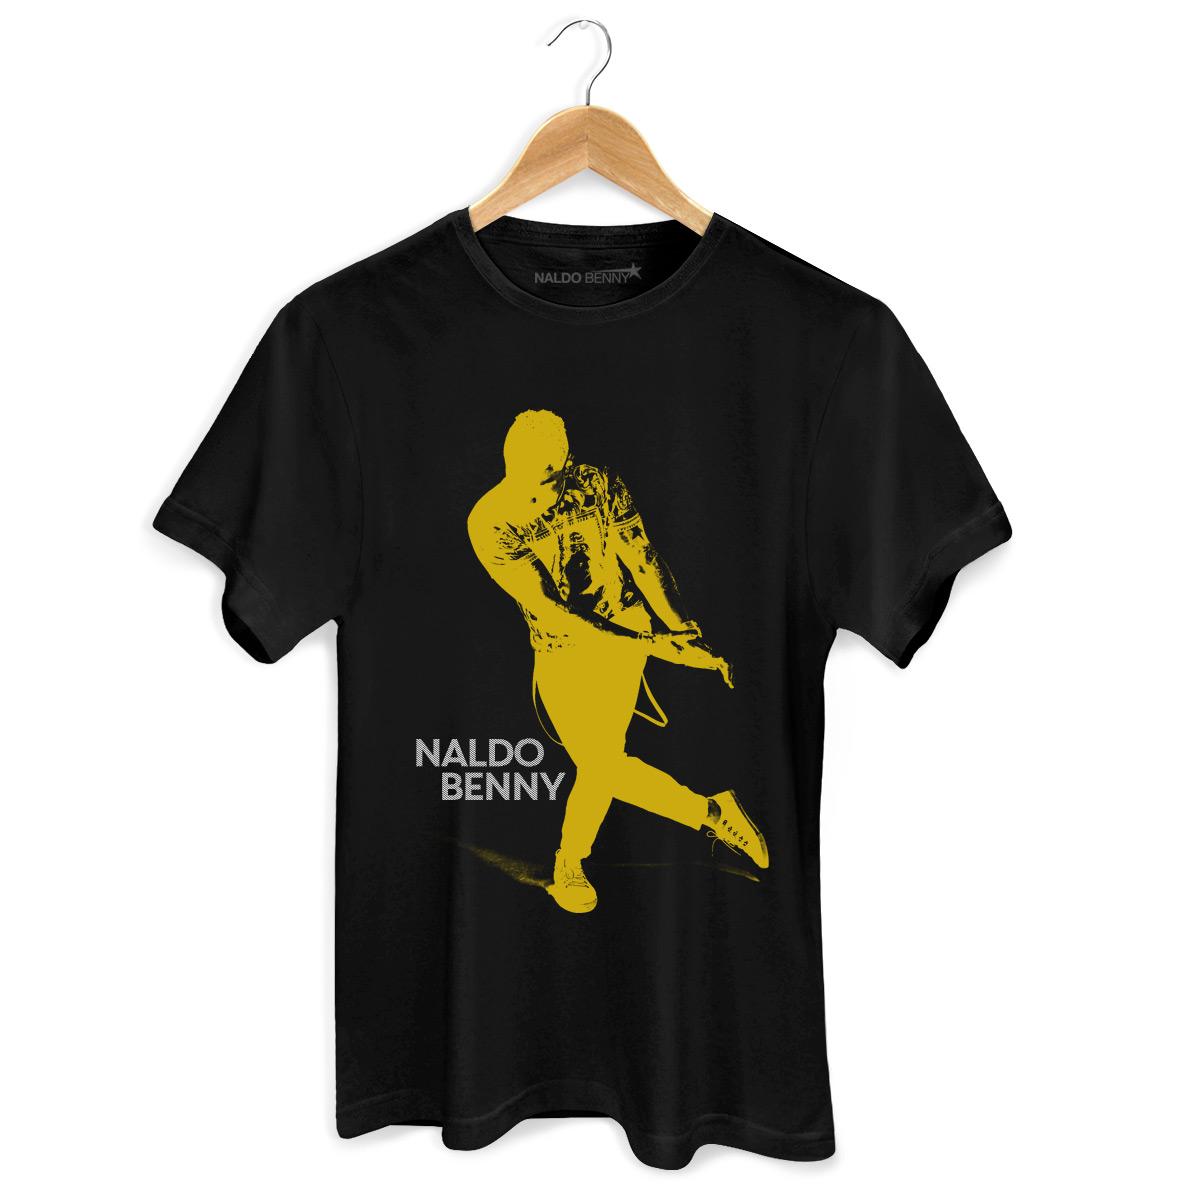 Camiseta Masculina Naldo Benny Se Joga Yellow